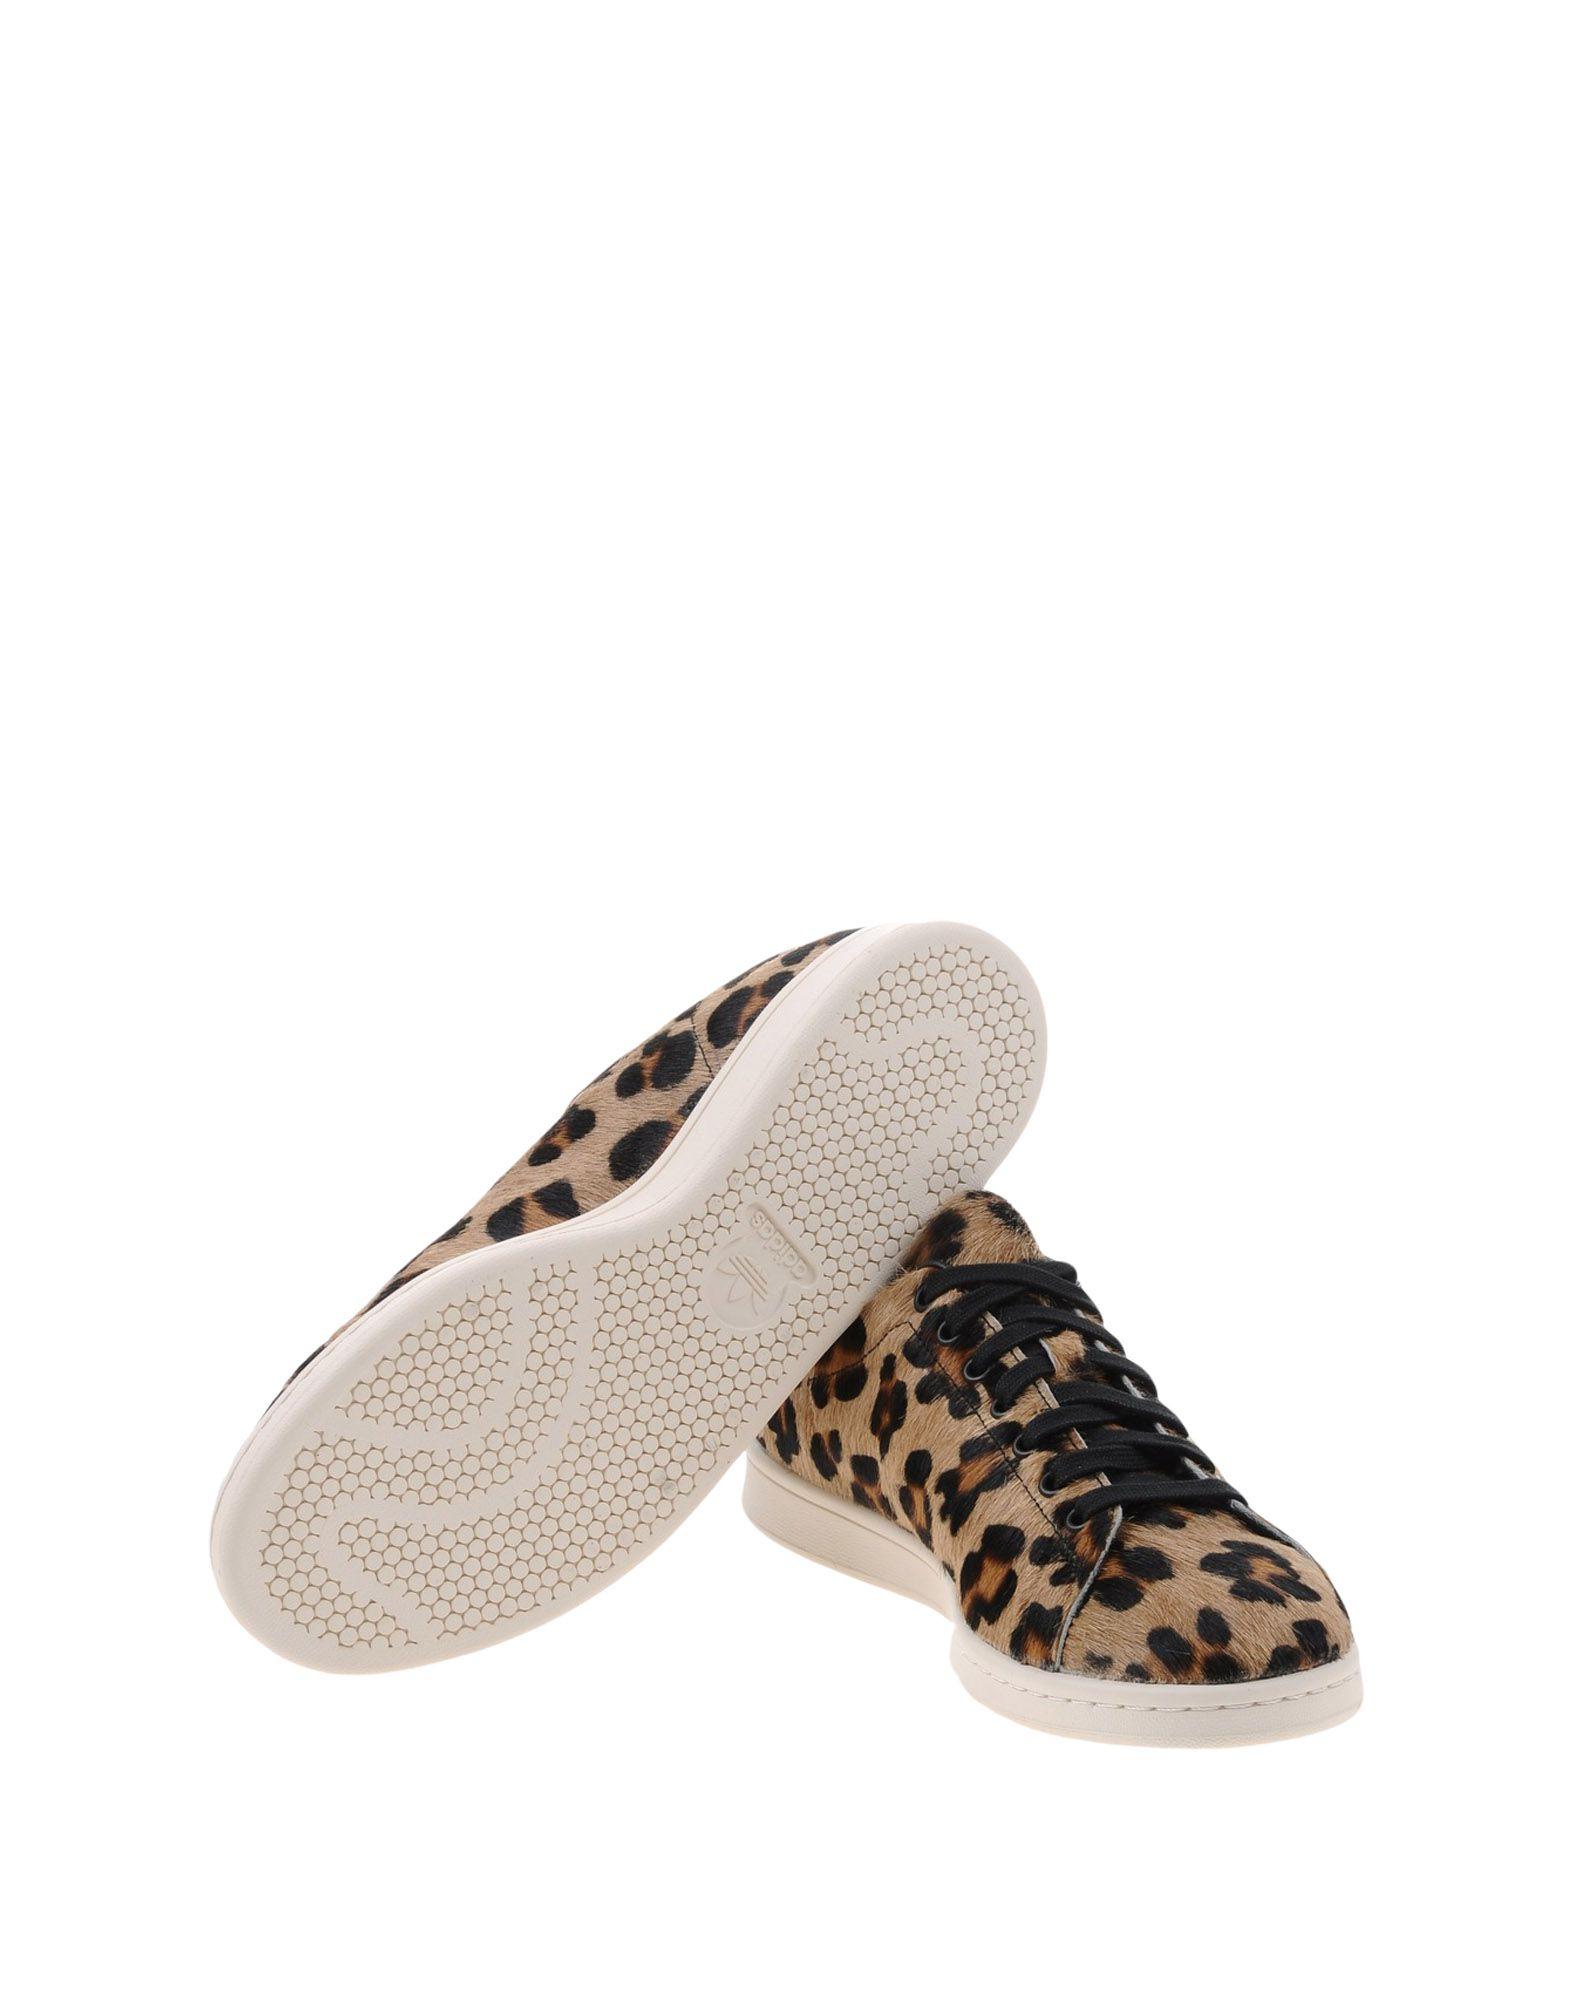 Sneakers Adidas Originals Stan Smith - Femme - Sneakers Adidas Originals sur